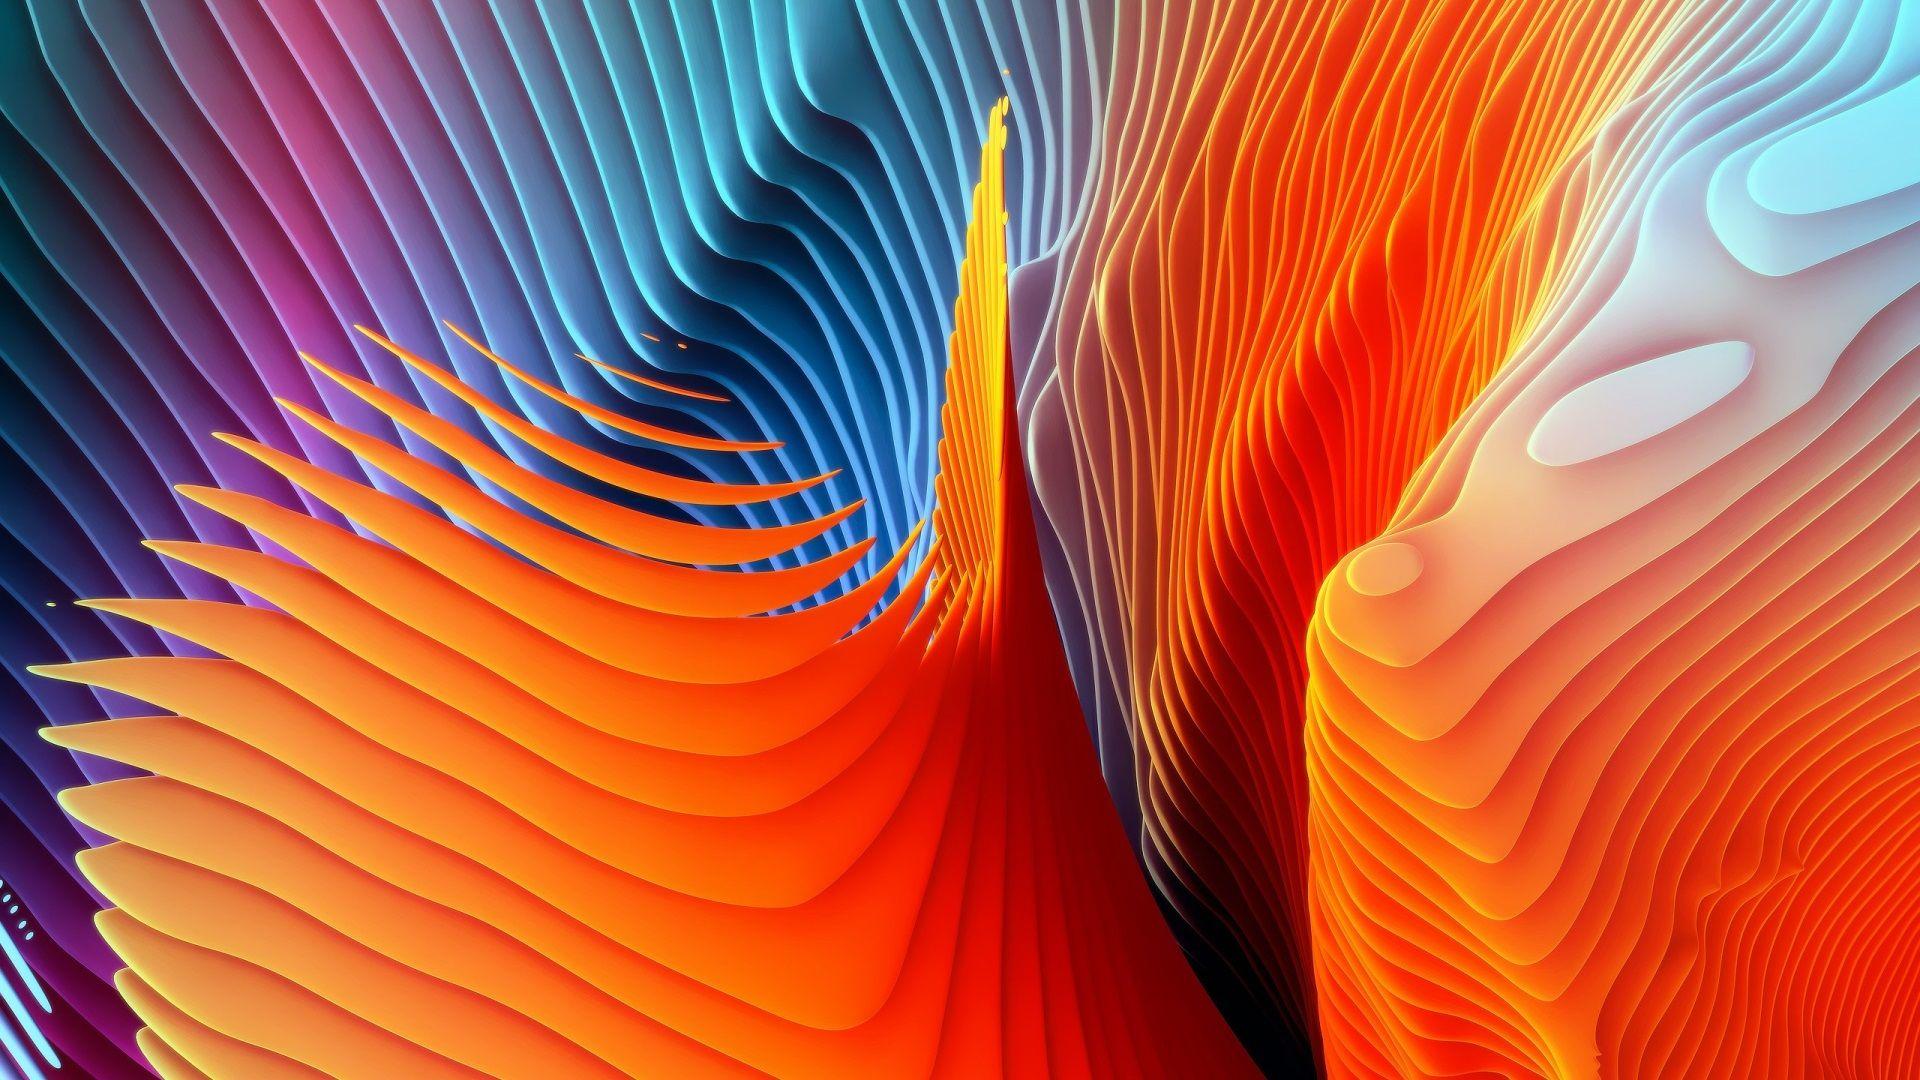 1920x1080 spiral high quality wallpaper for desktop